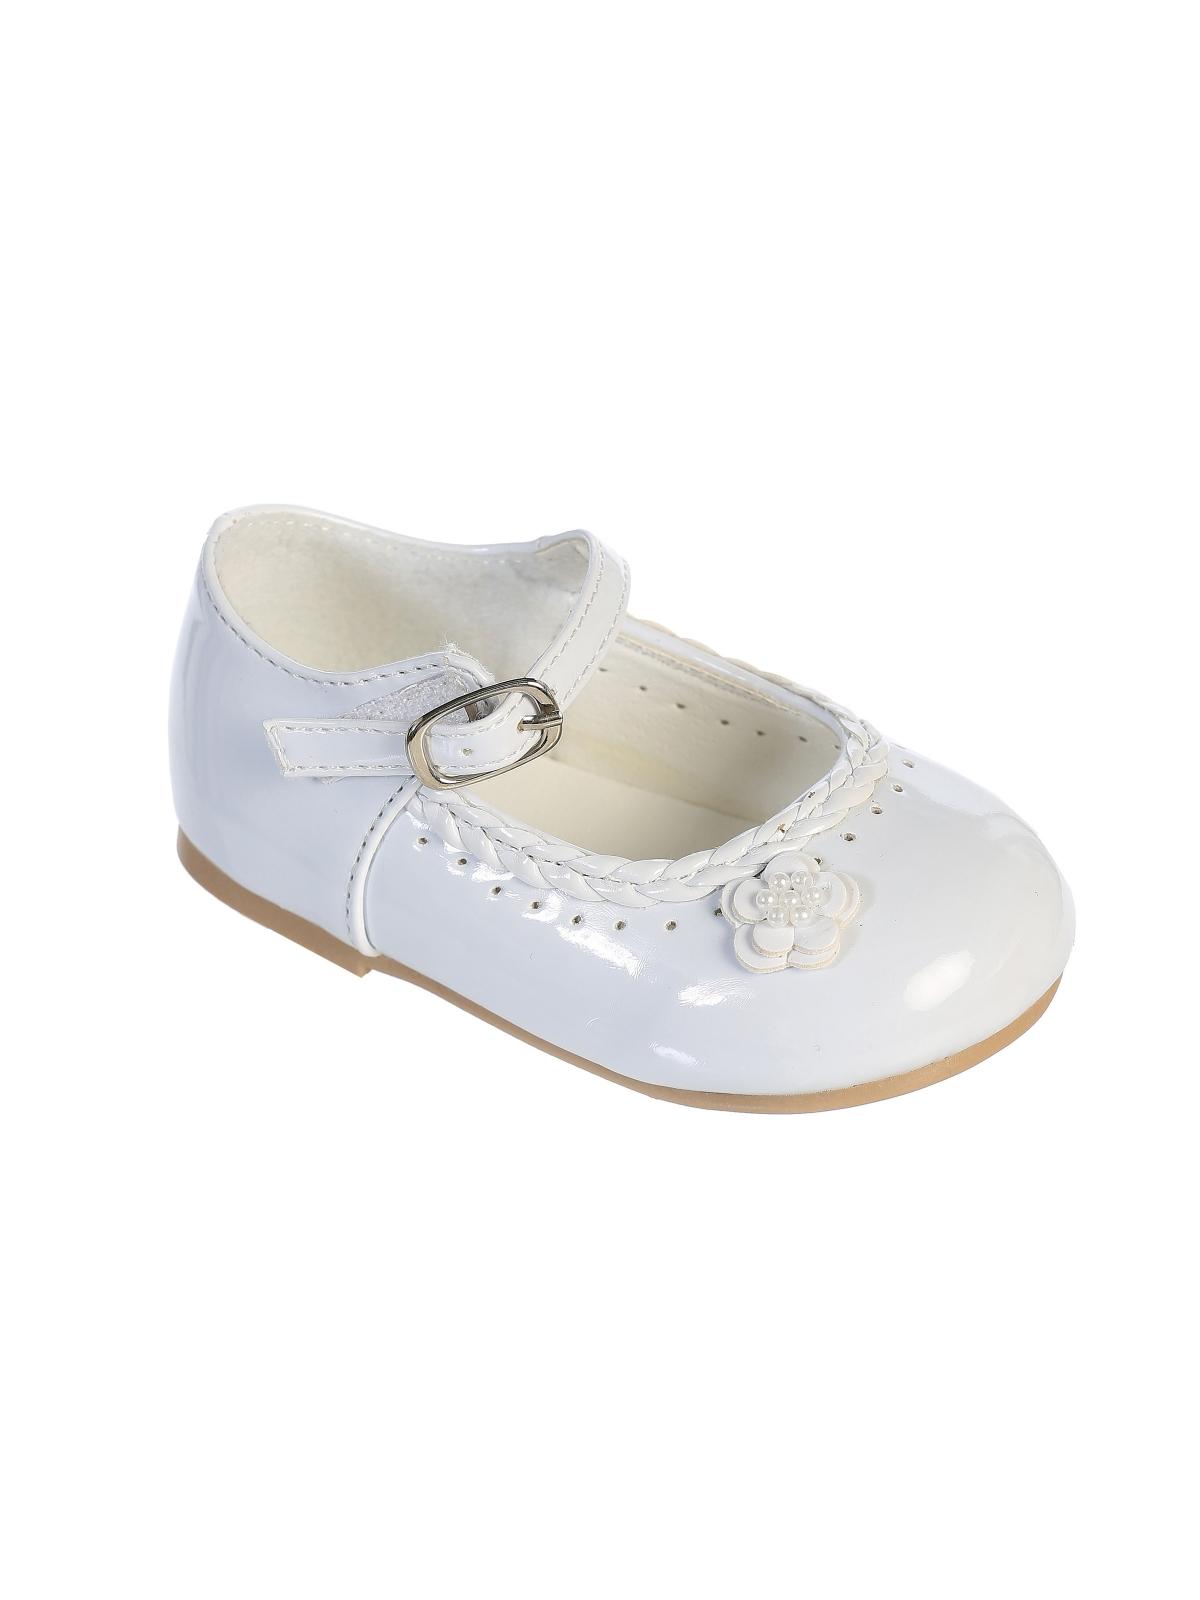 Shoes flower girl dresses flower girl dress for less flower girl shoe style s47 soft patent mary jane shoe with cute flower infant izmirmasajfo